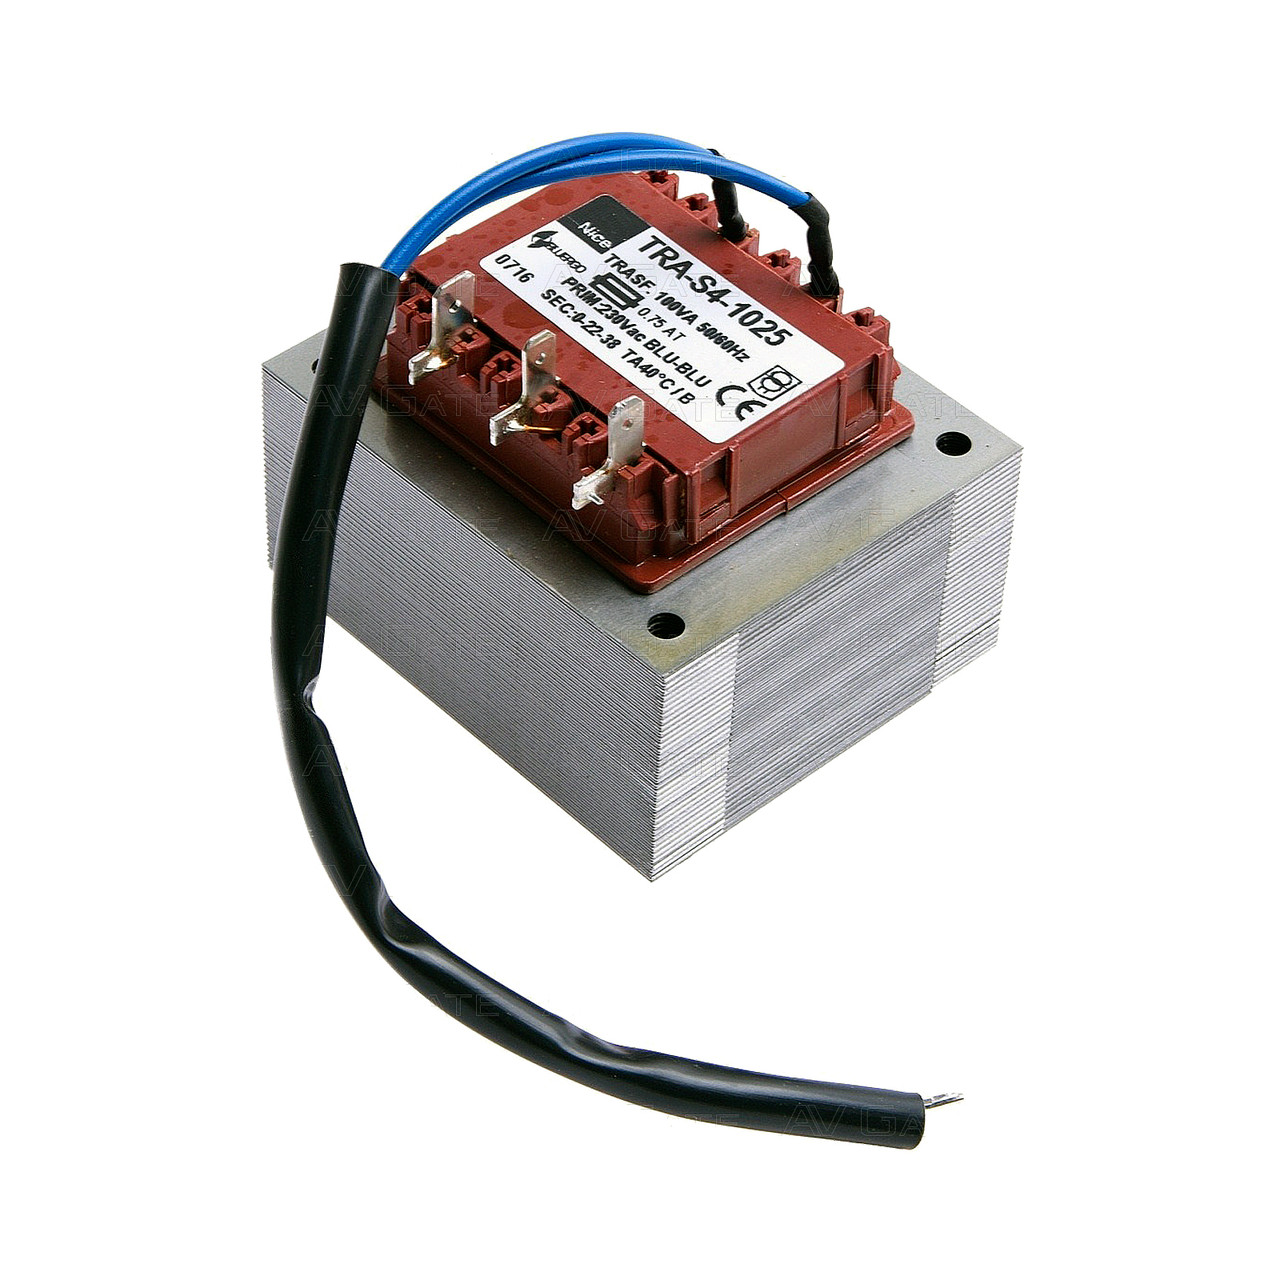 Трансформатор ROAD / SPIN / Nice SHEL TRA-S4.1025